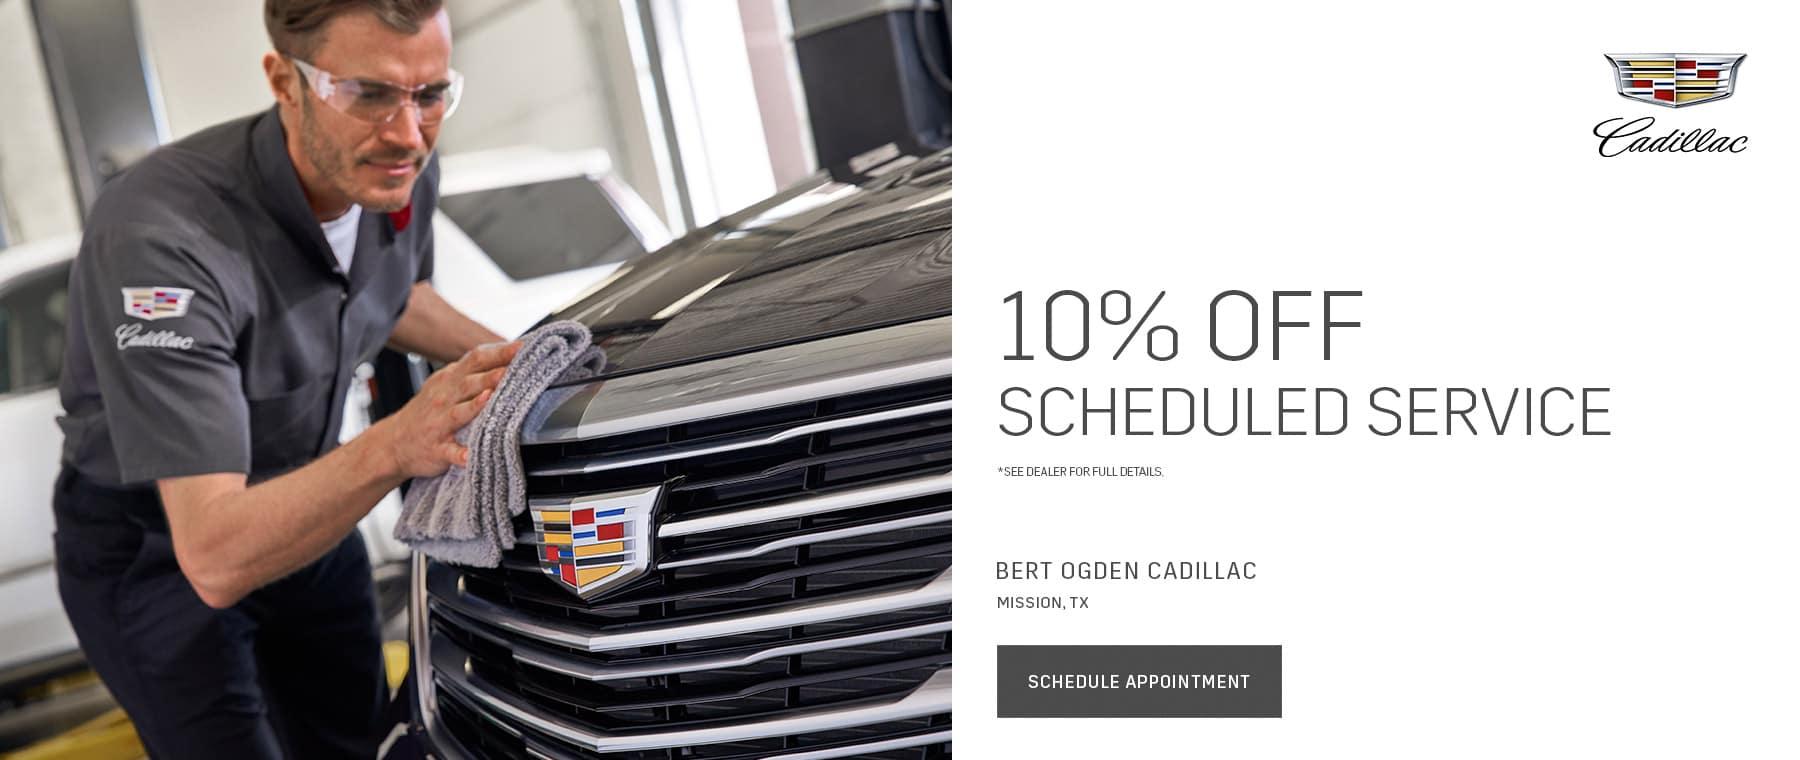 10% Off Scheduled Service - Bert Ogden Cadillac in Mission, Texas